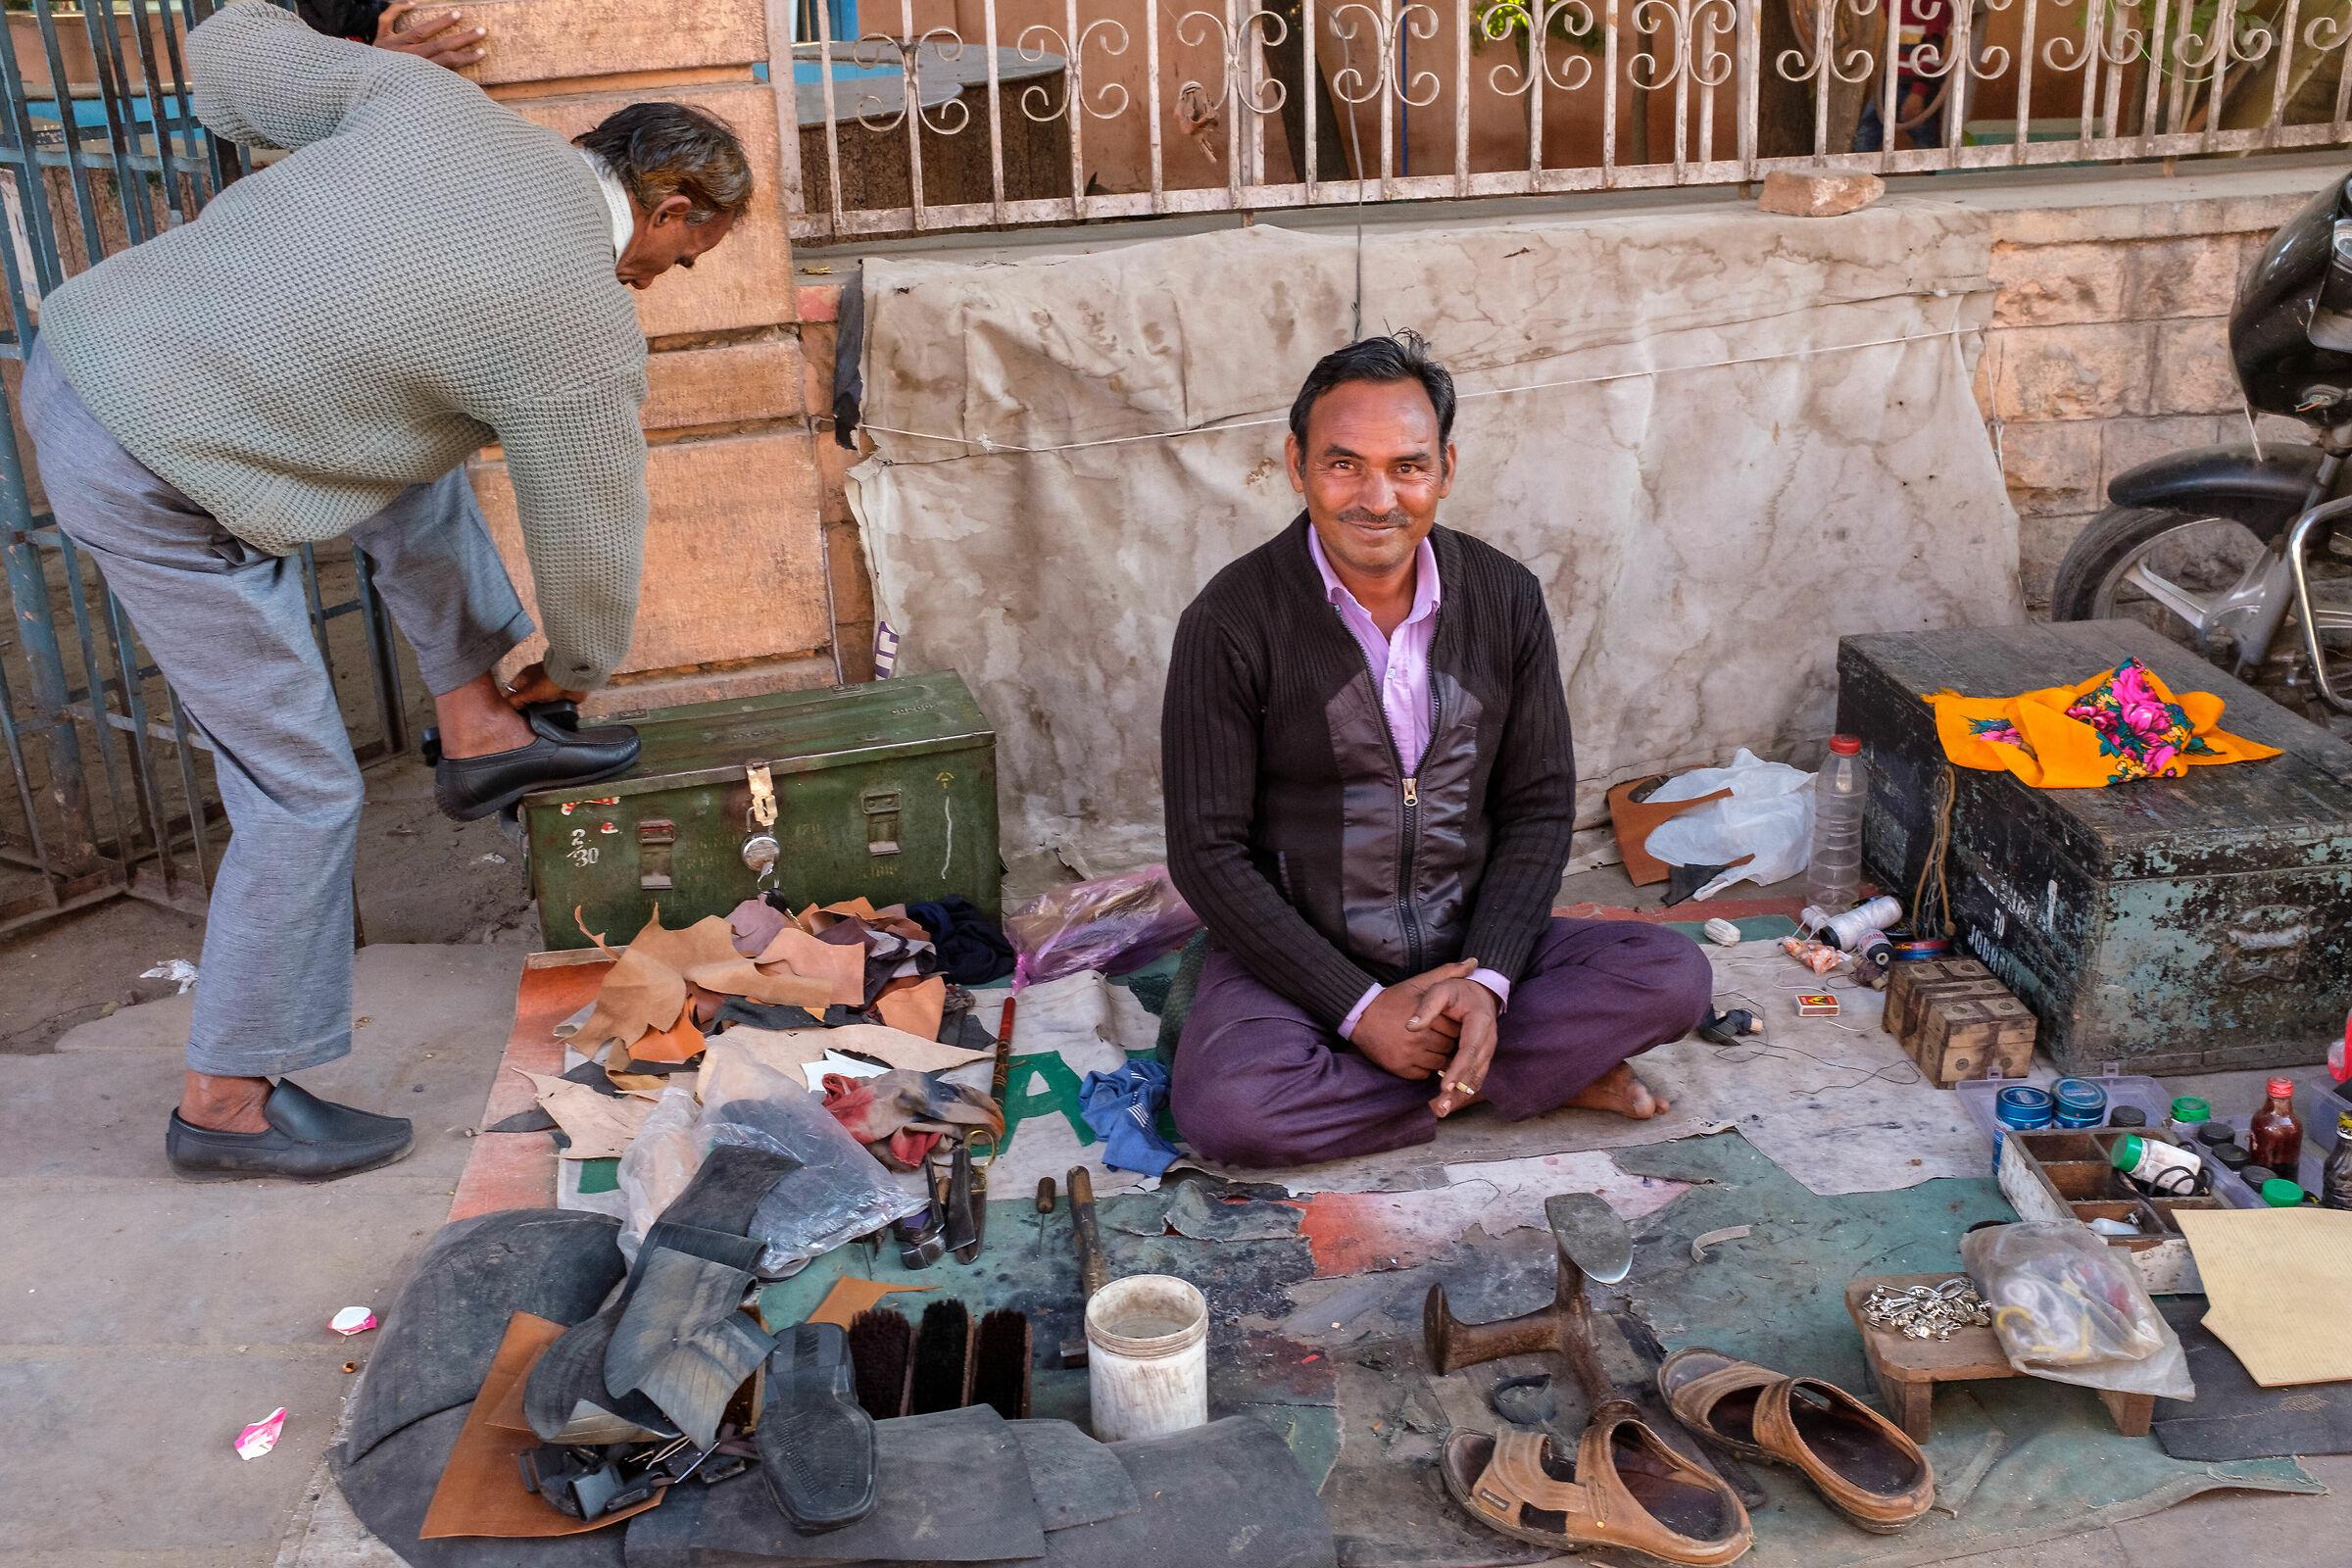 The Shoemaker...